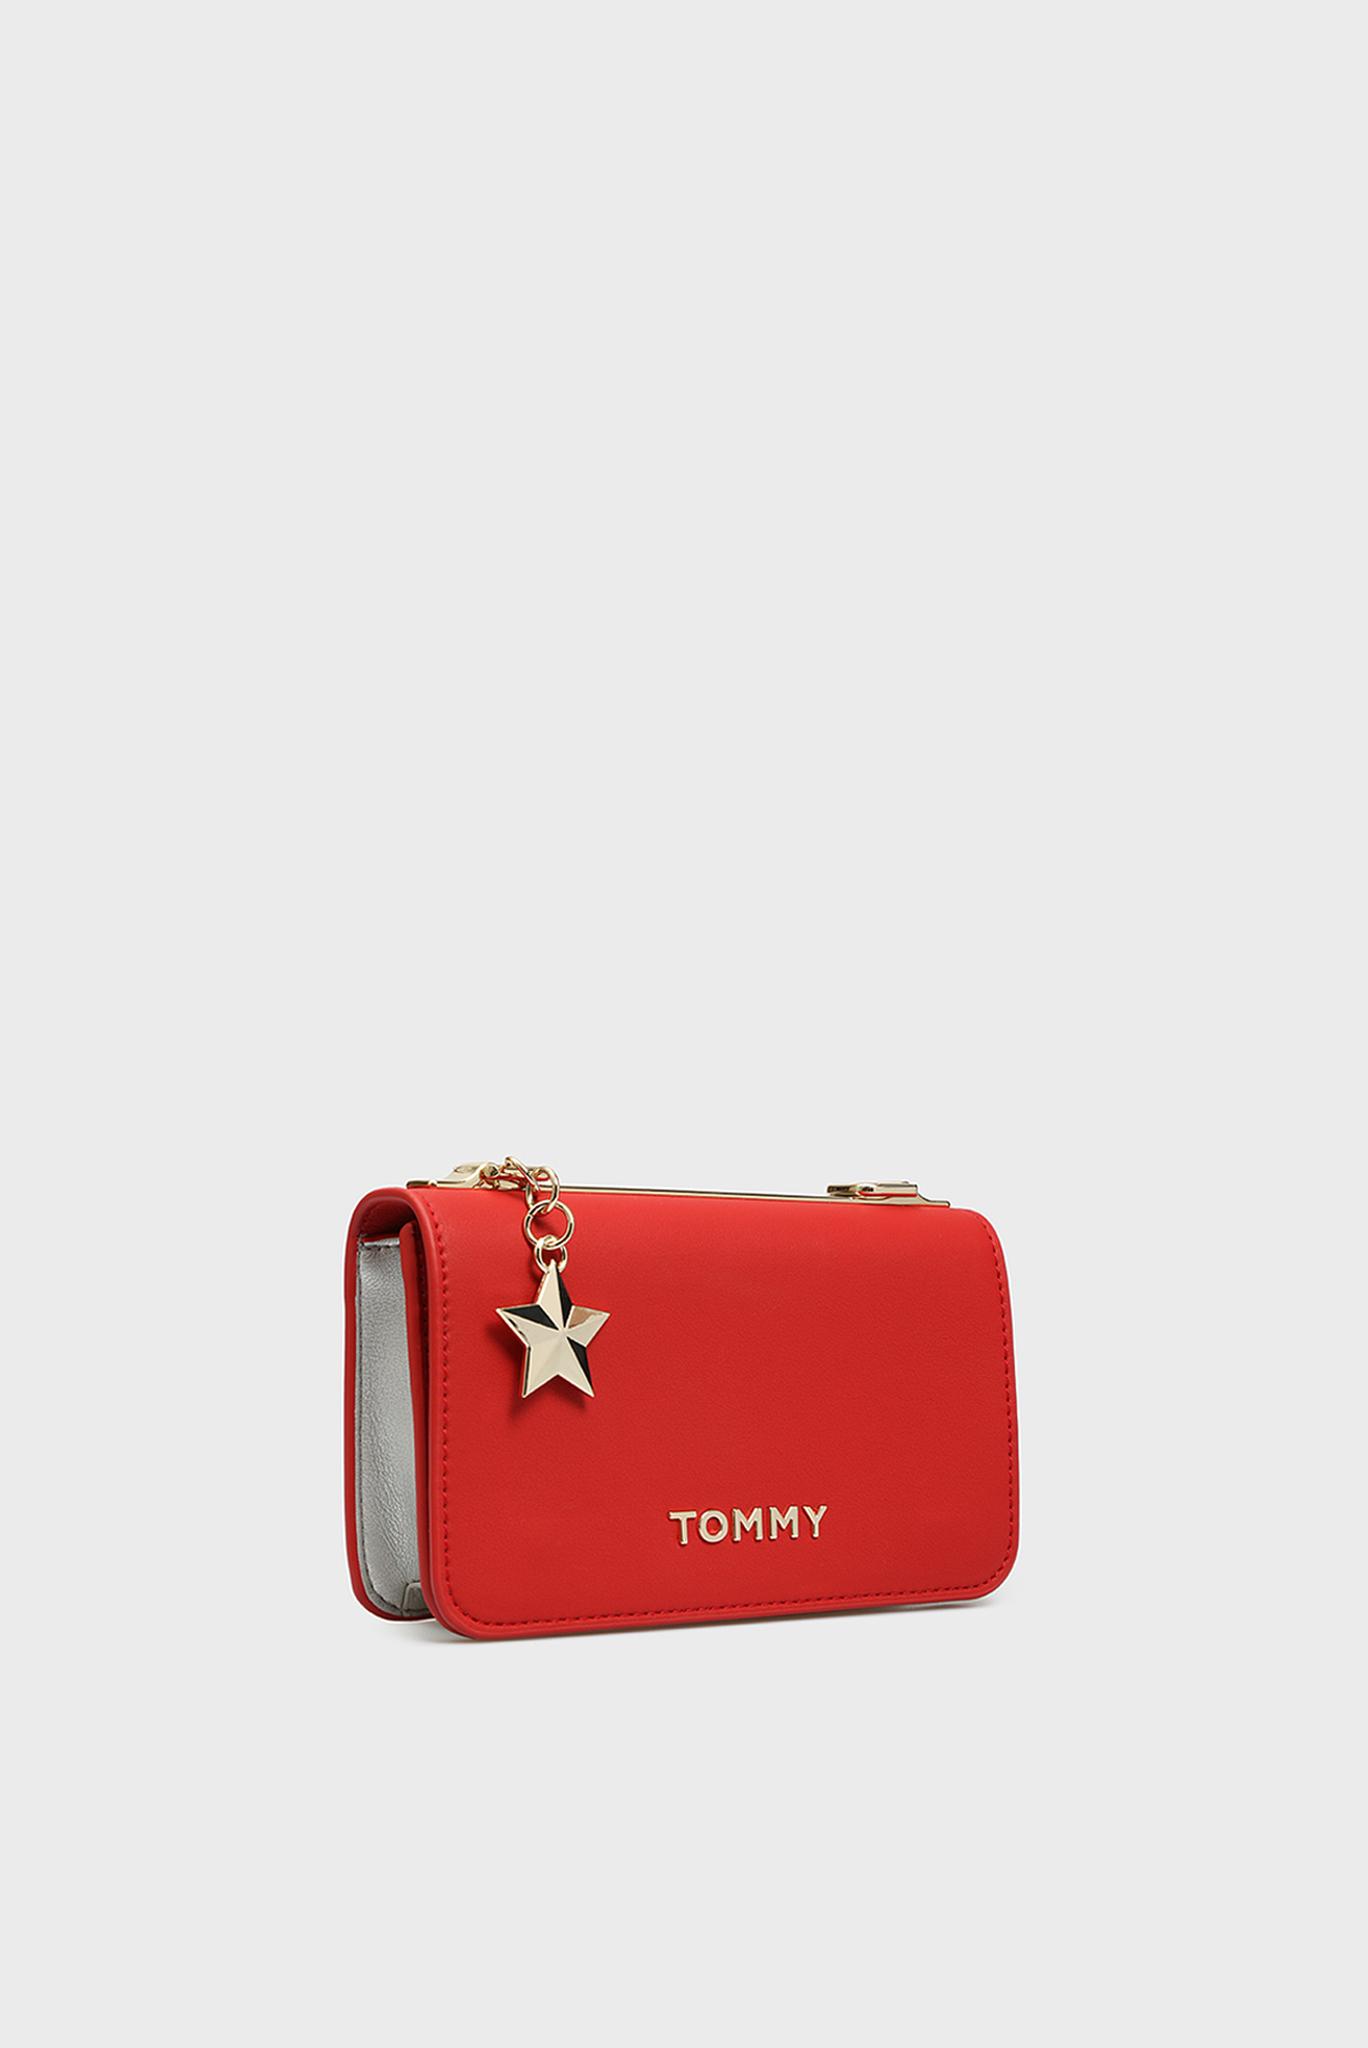 Женская красная сумка через плечо TOMMY STATEMENT CROSSOVER Tommy Hilfiger